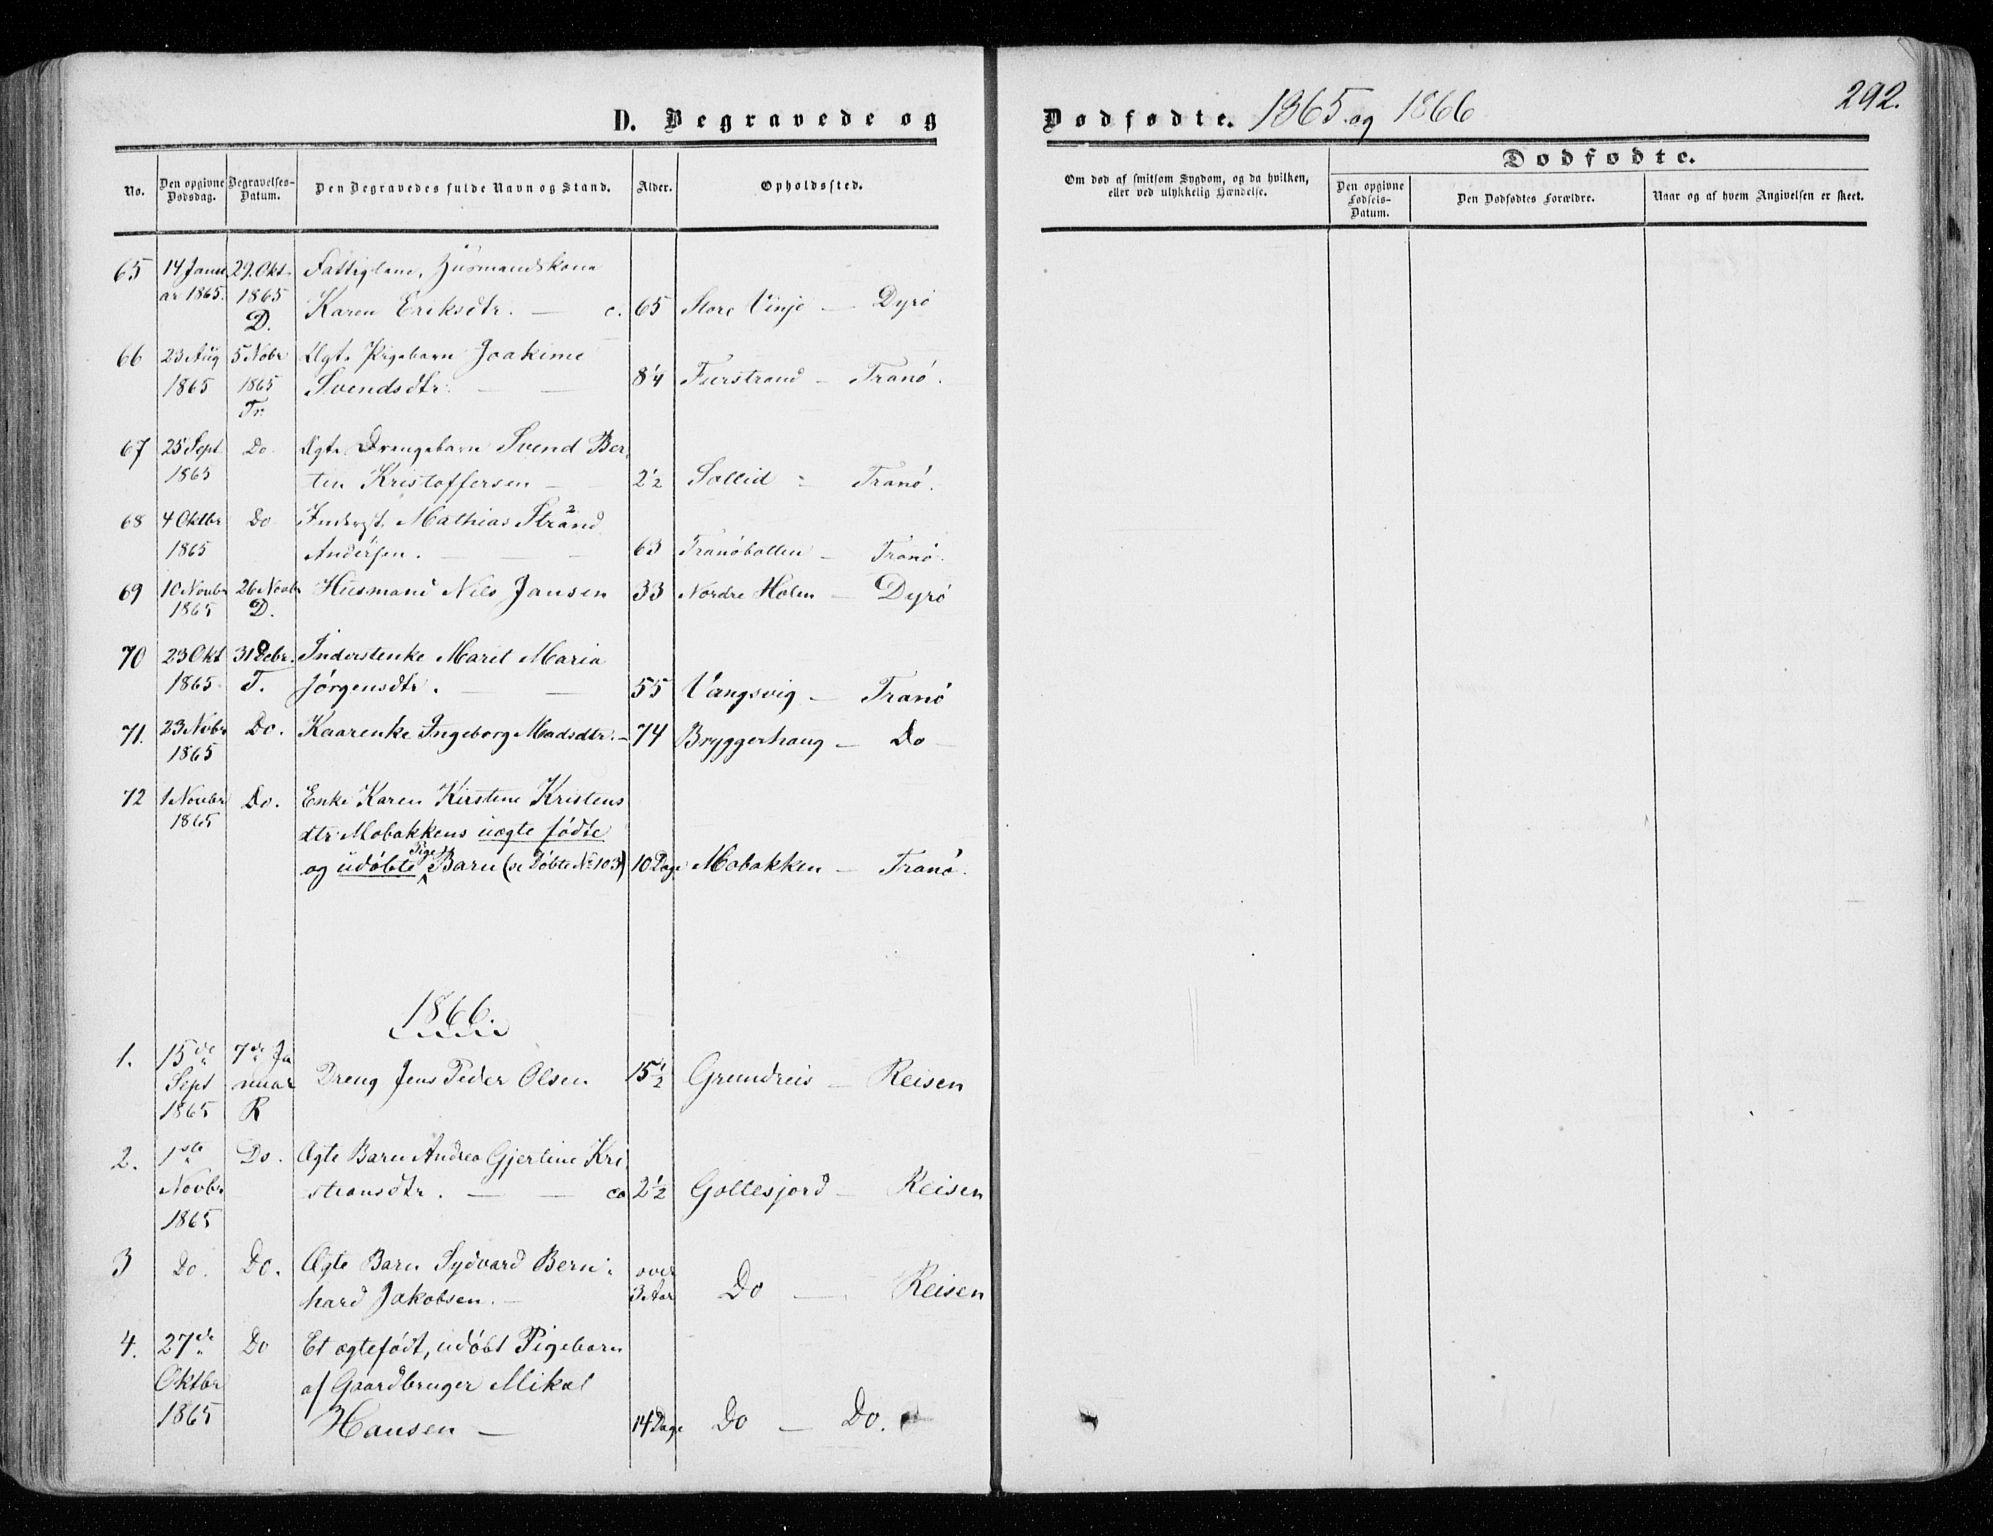 SATØ, Tranøy sokneprestkontor, I/Ia/Iaa/L0007kirke: Ministerialbok nr. 7, 1856-1866, s. 292